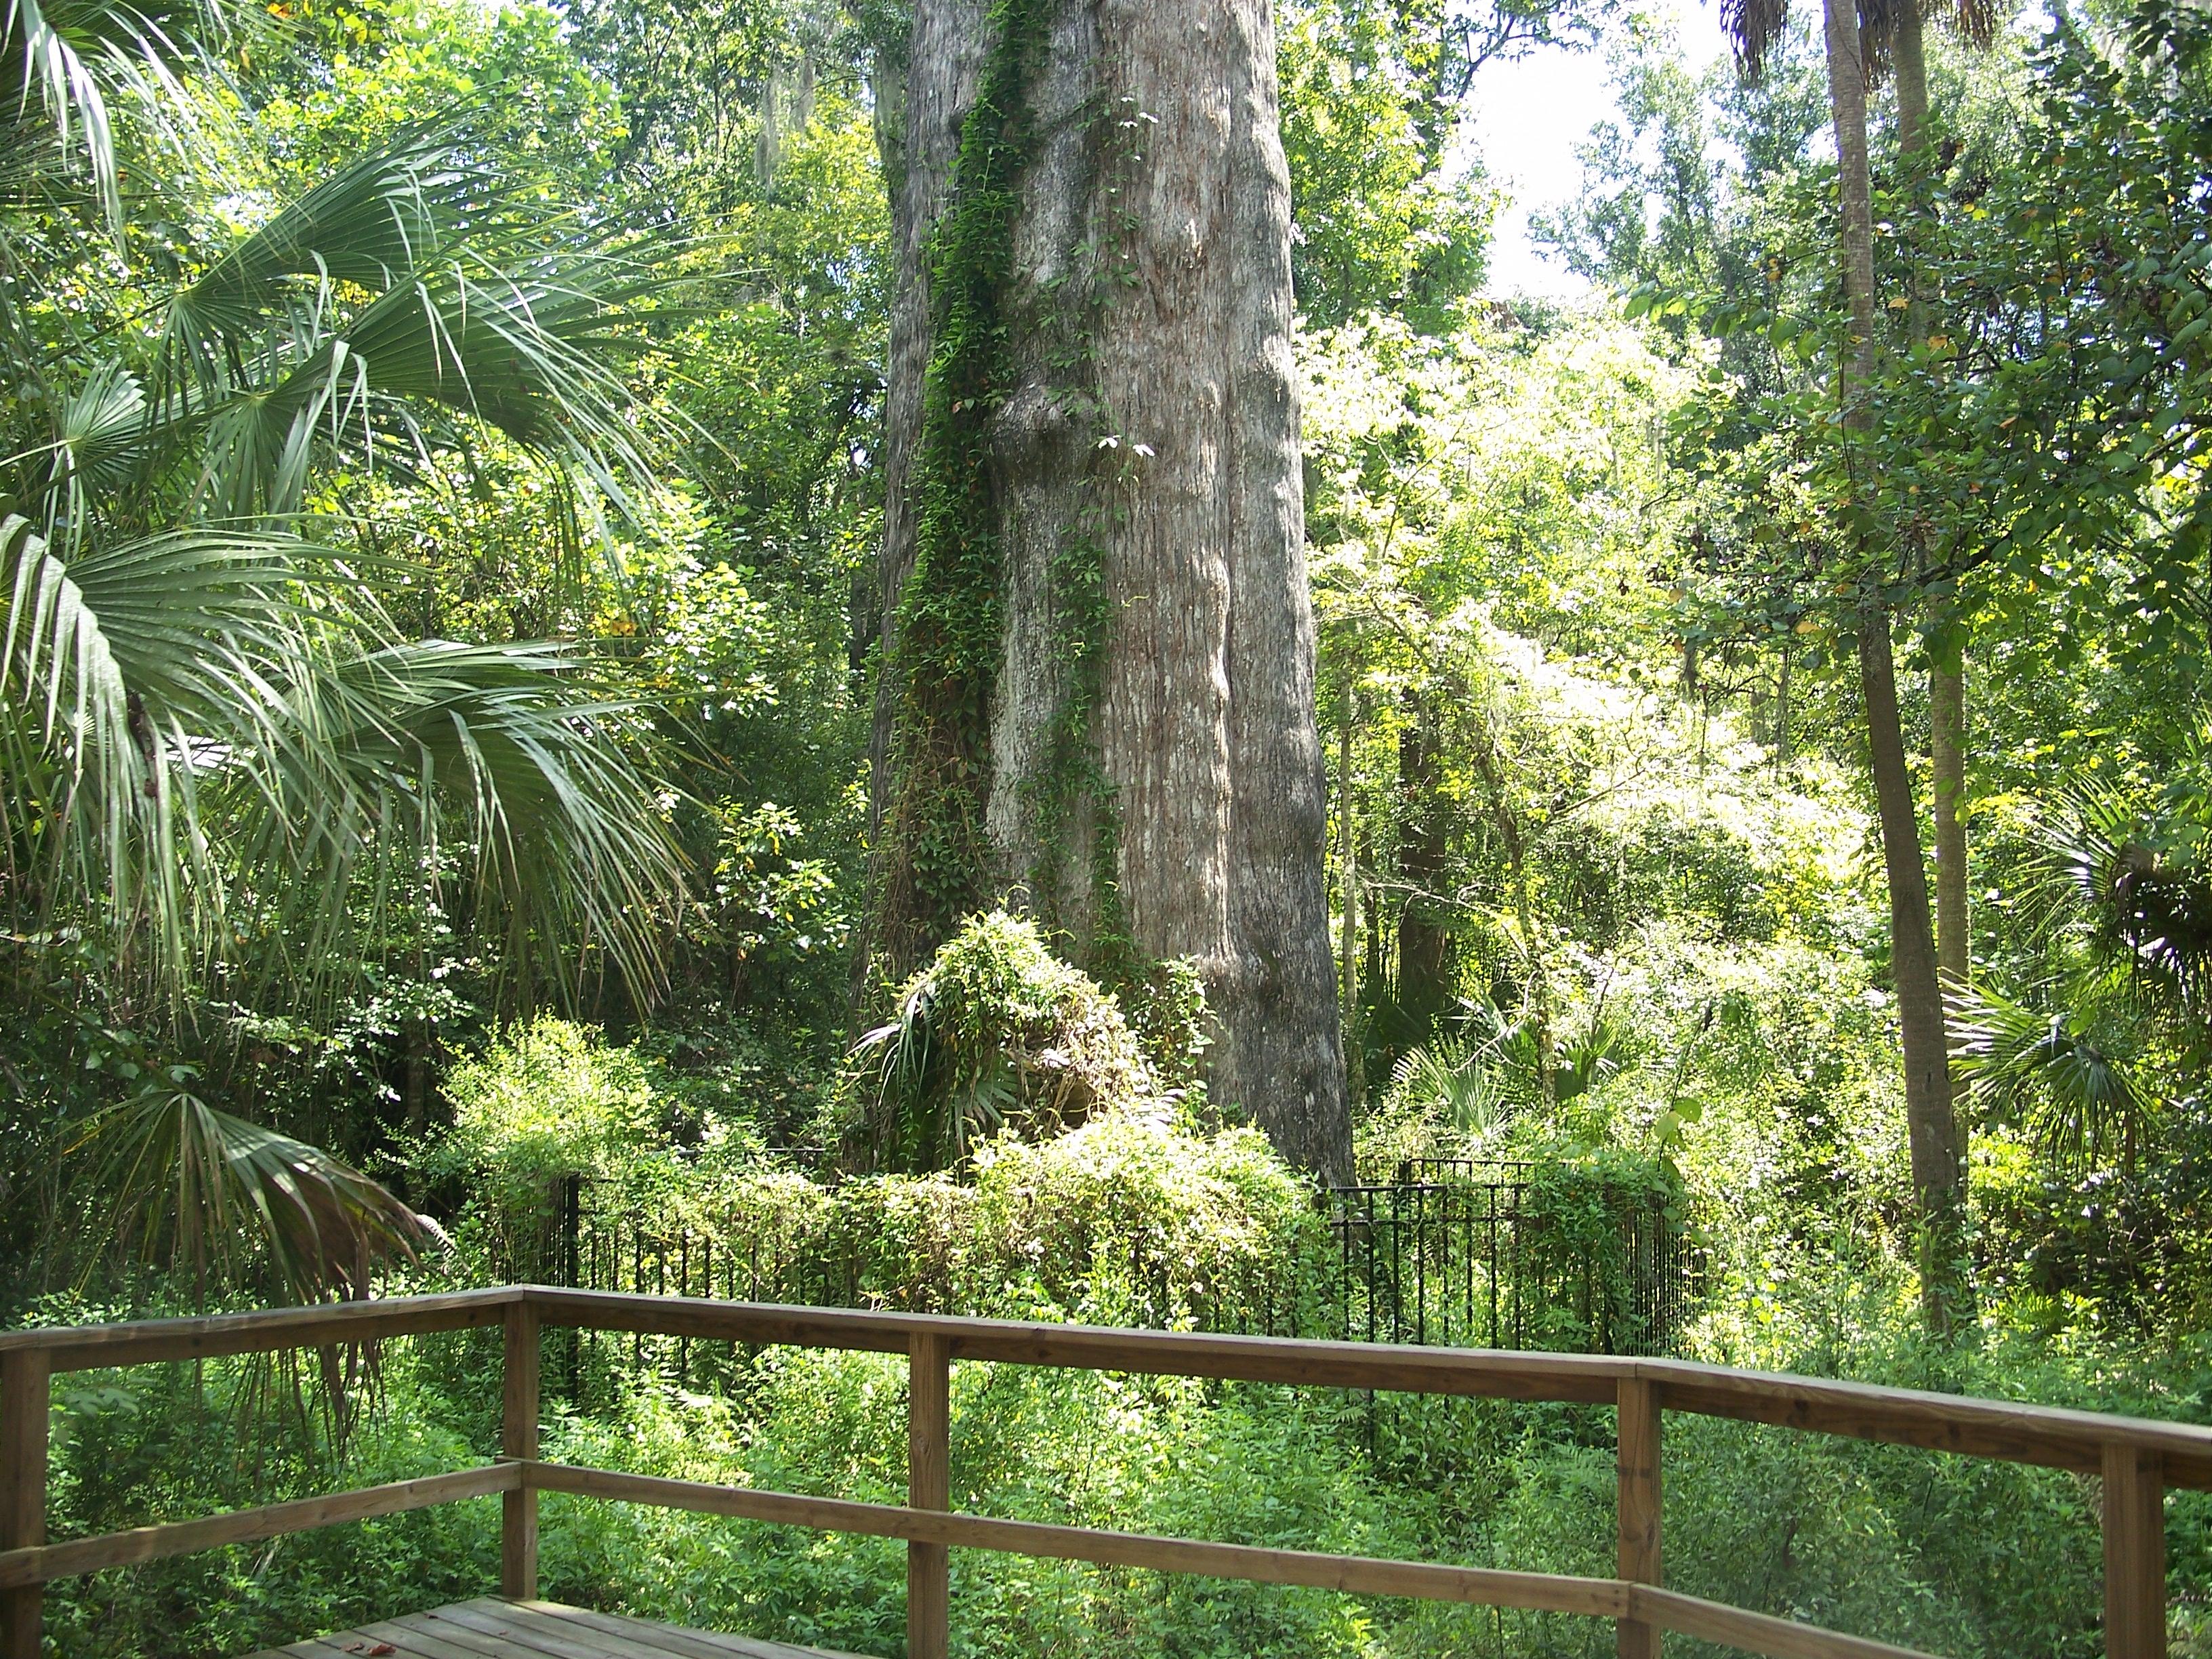 Senator Tree